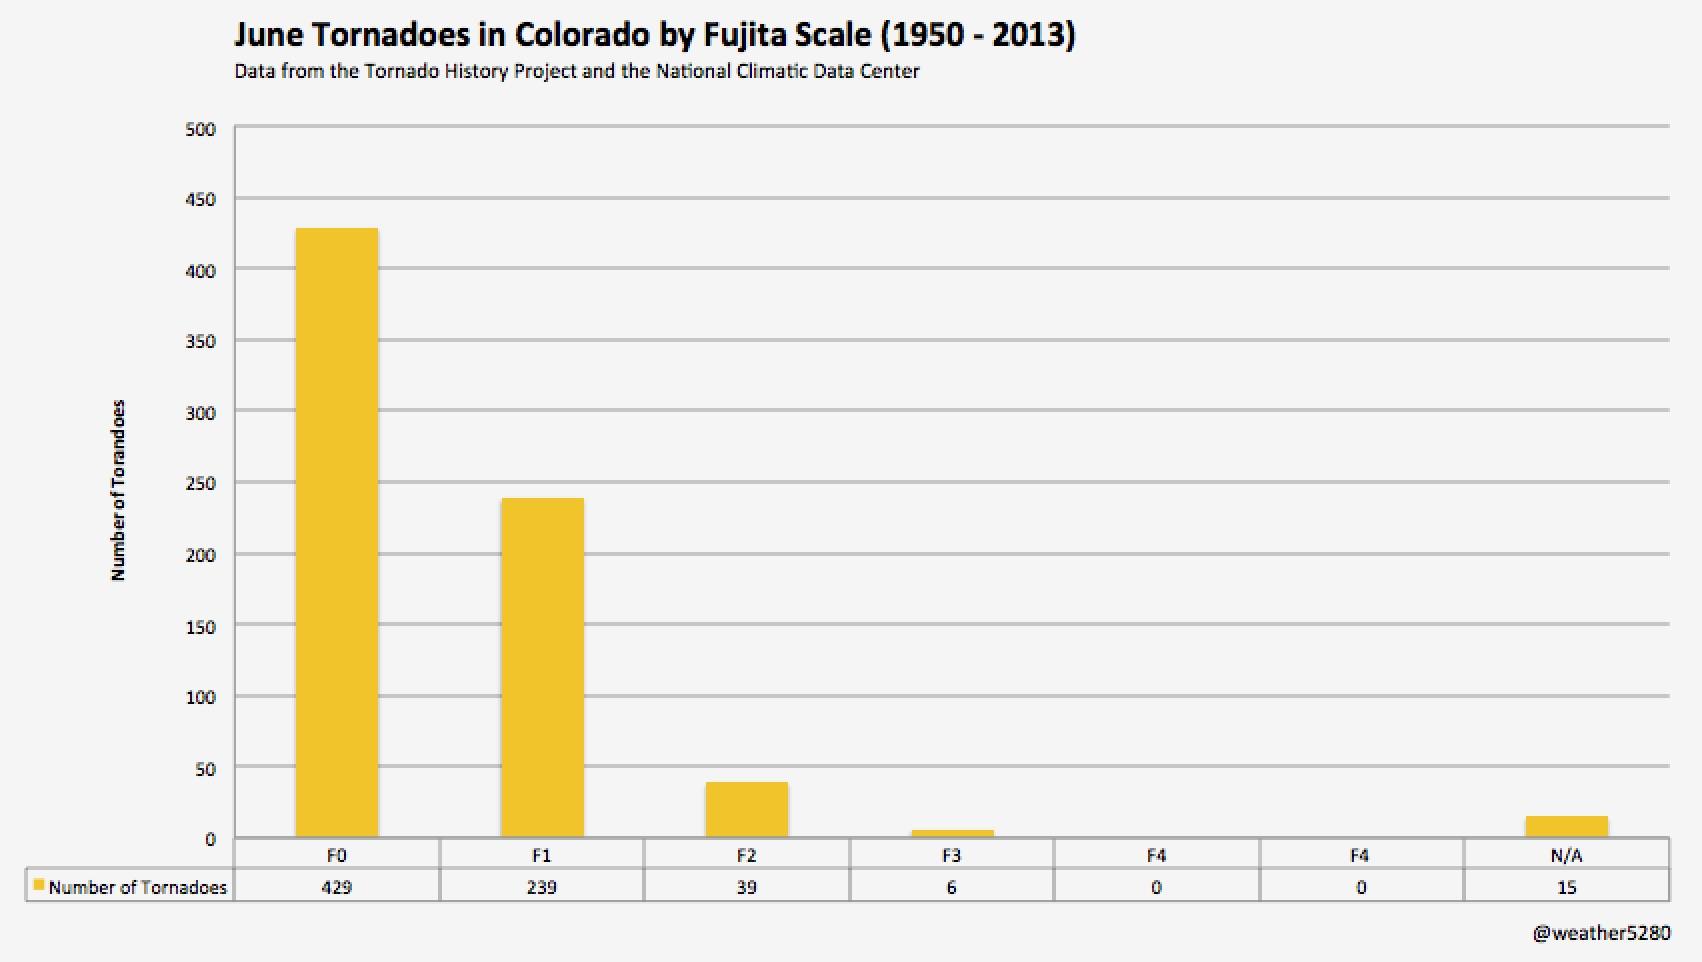 Number of June tornadoes in Colorado by Fujita scale | Weathr2580, NCDC, Tornado History Project